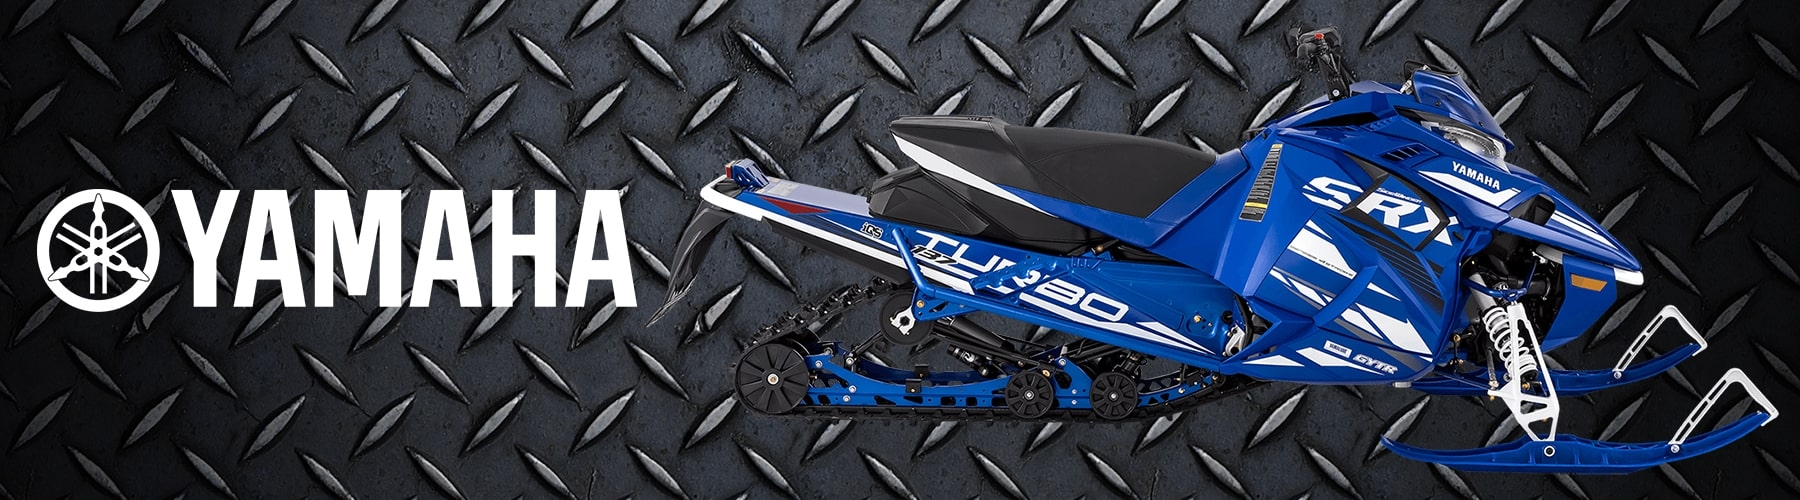 Yamaha Sidewinder & SRX